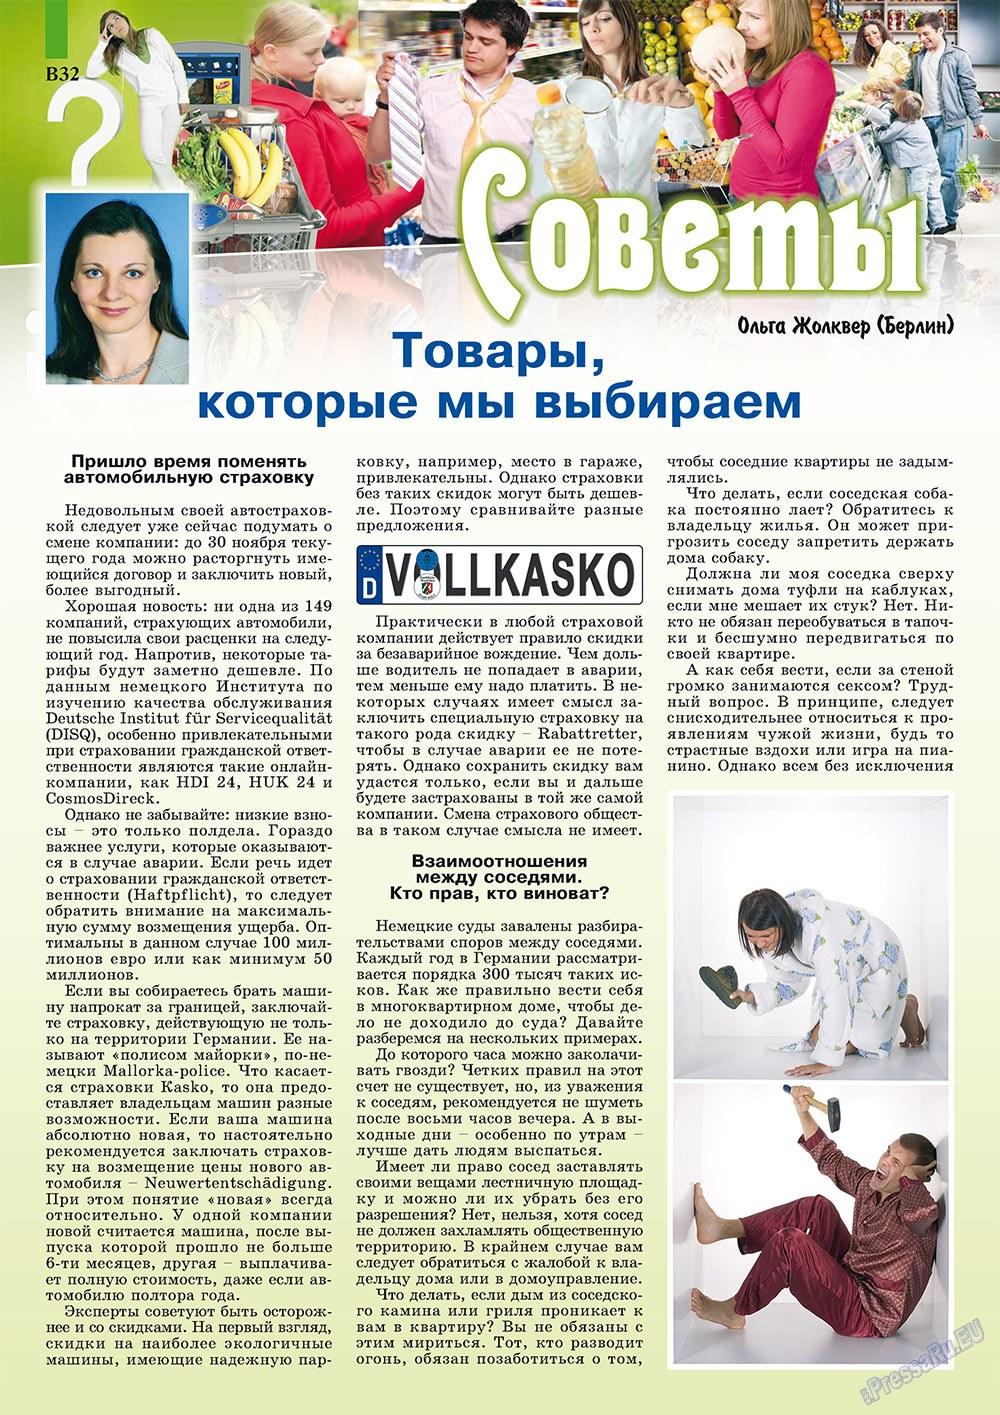 Партнер-север (журнал). 2011 год, номер 10, стр. 42